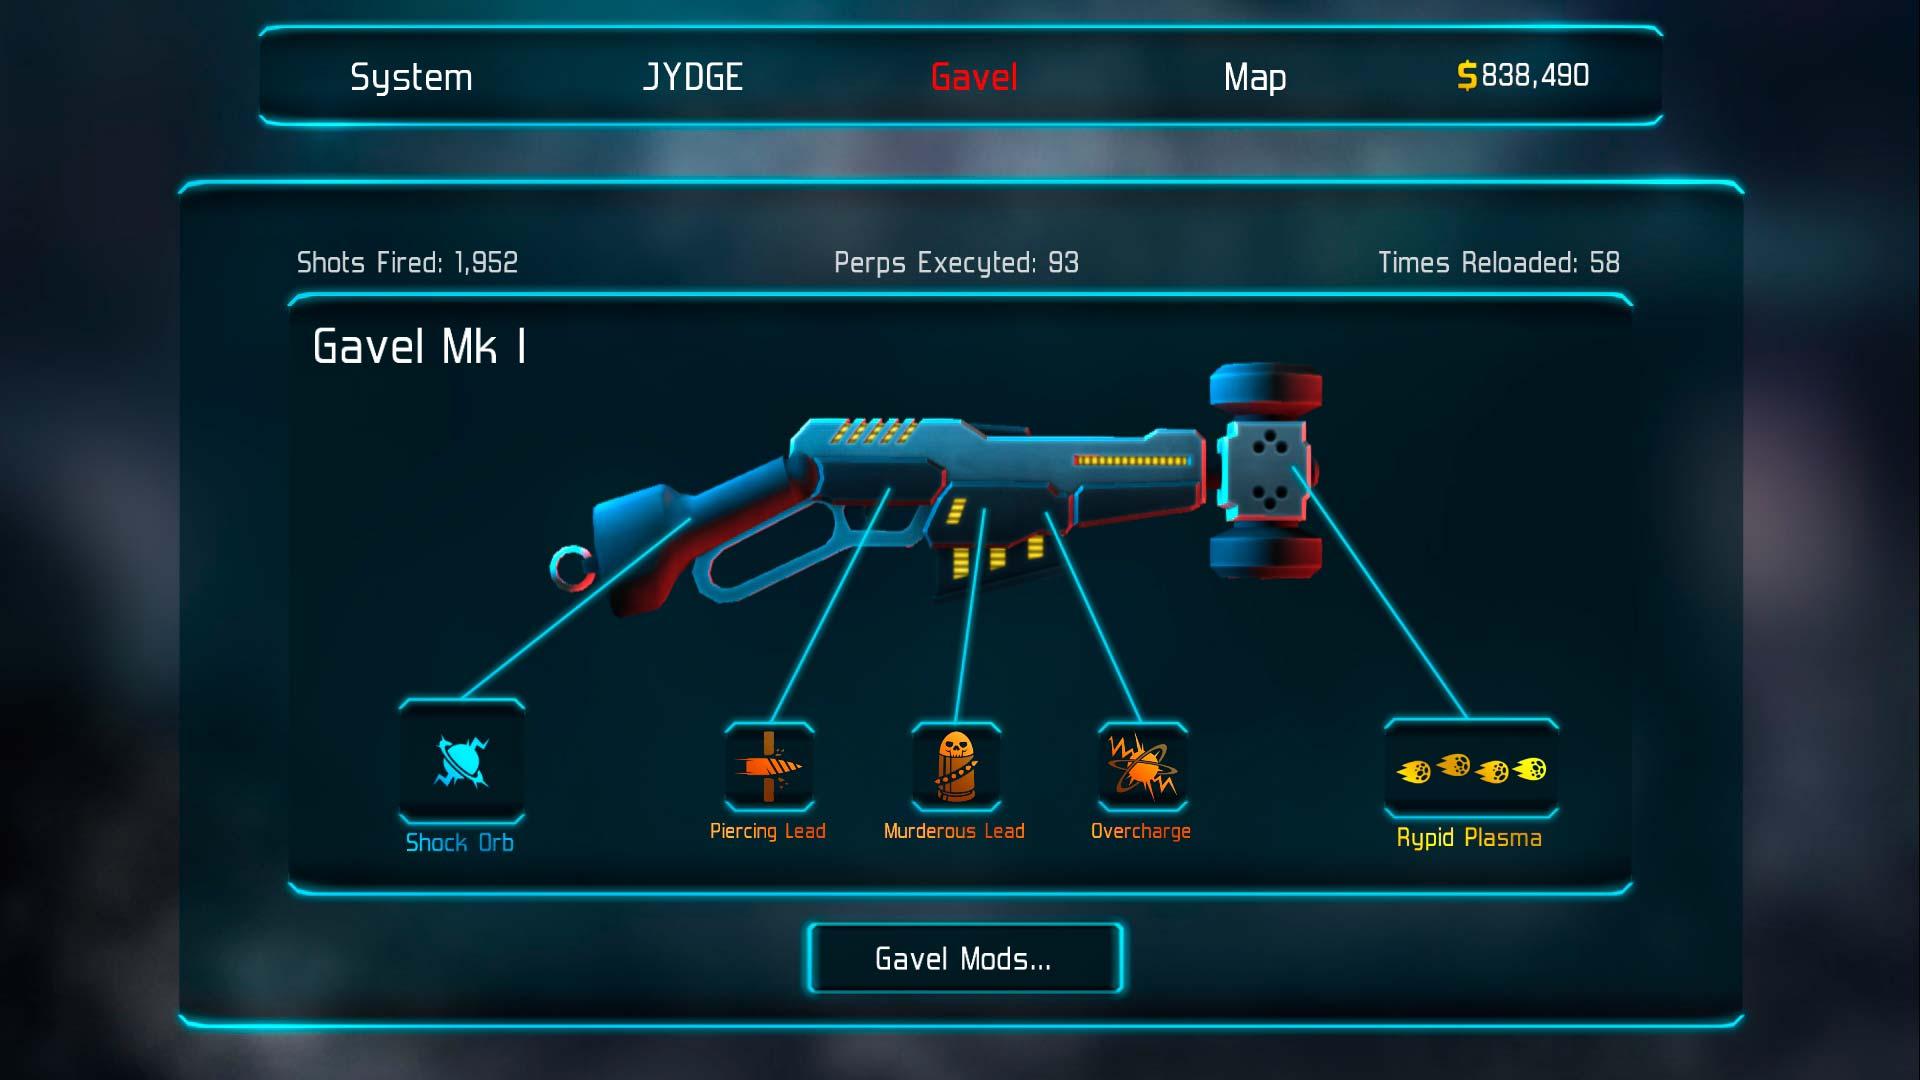 Скриншоты к JYDGE v1.2.1.0 полная версия на русском